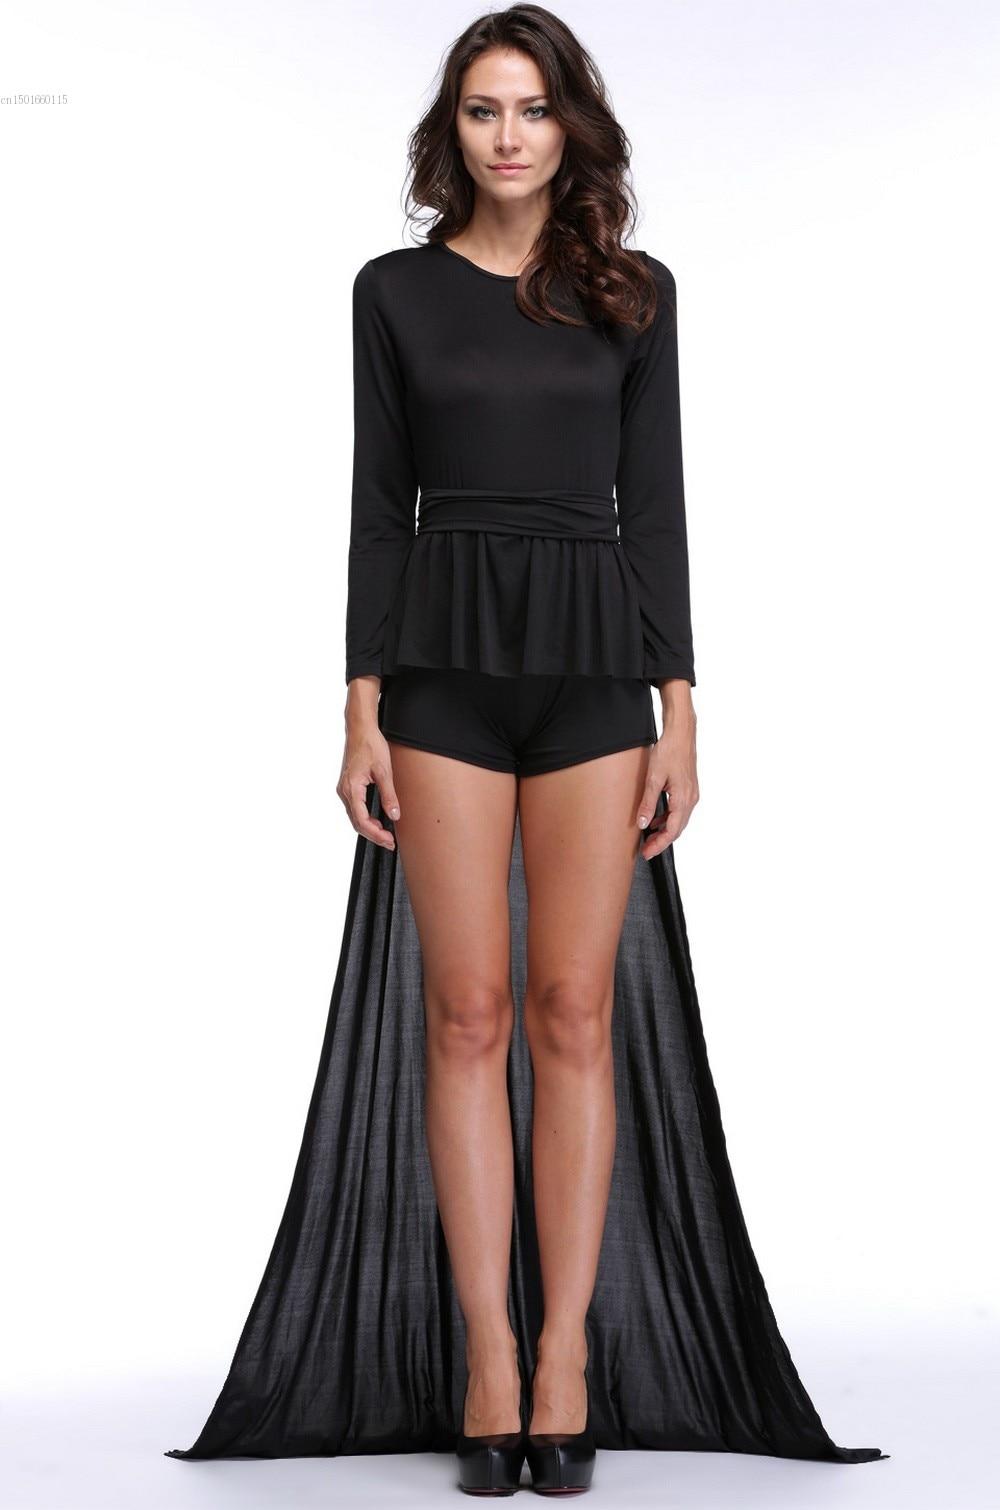 2017 hot sexy women rompers jumpsuit lady elegant long